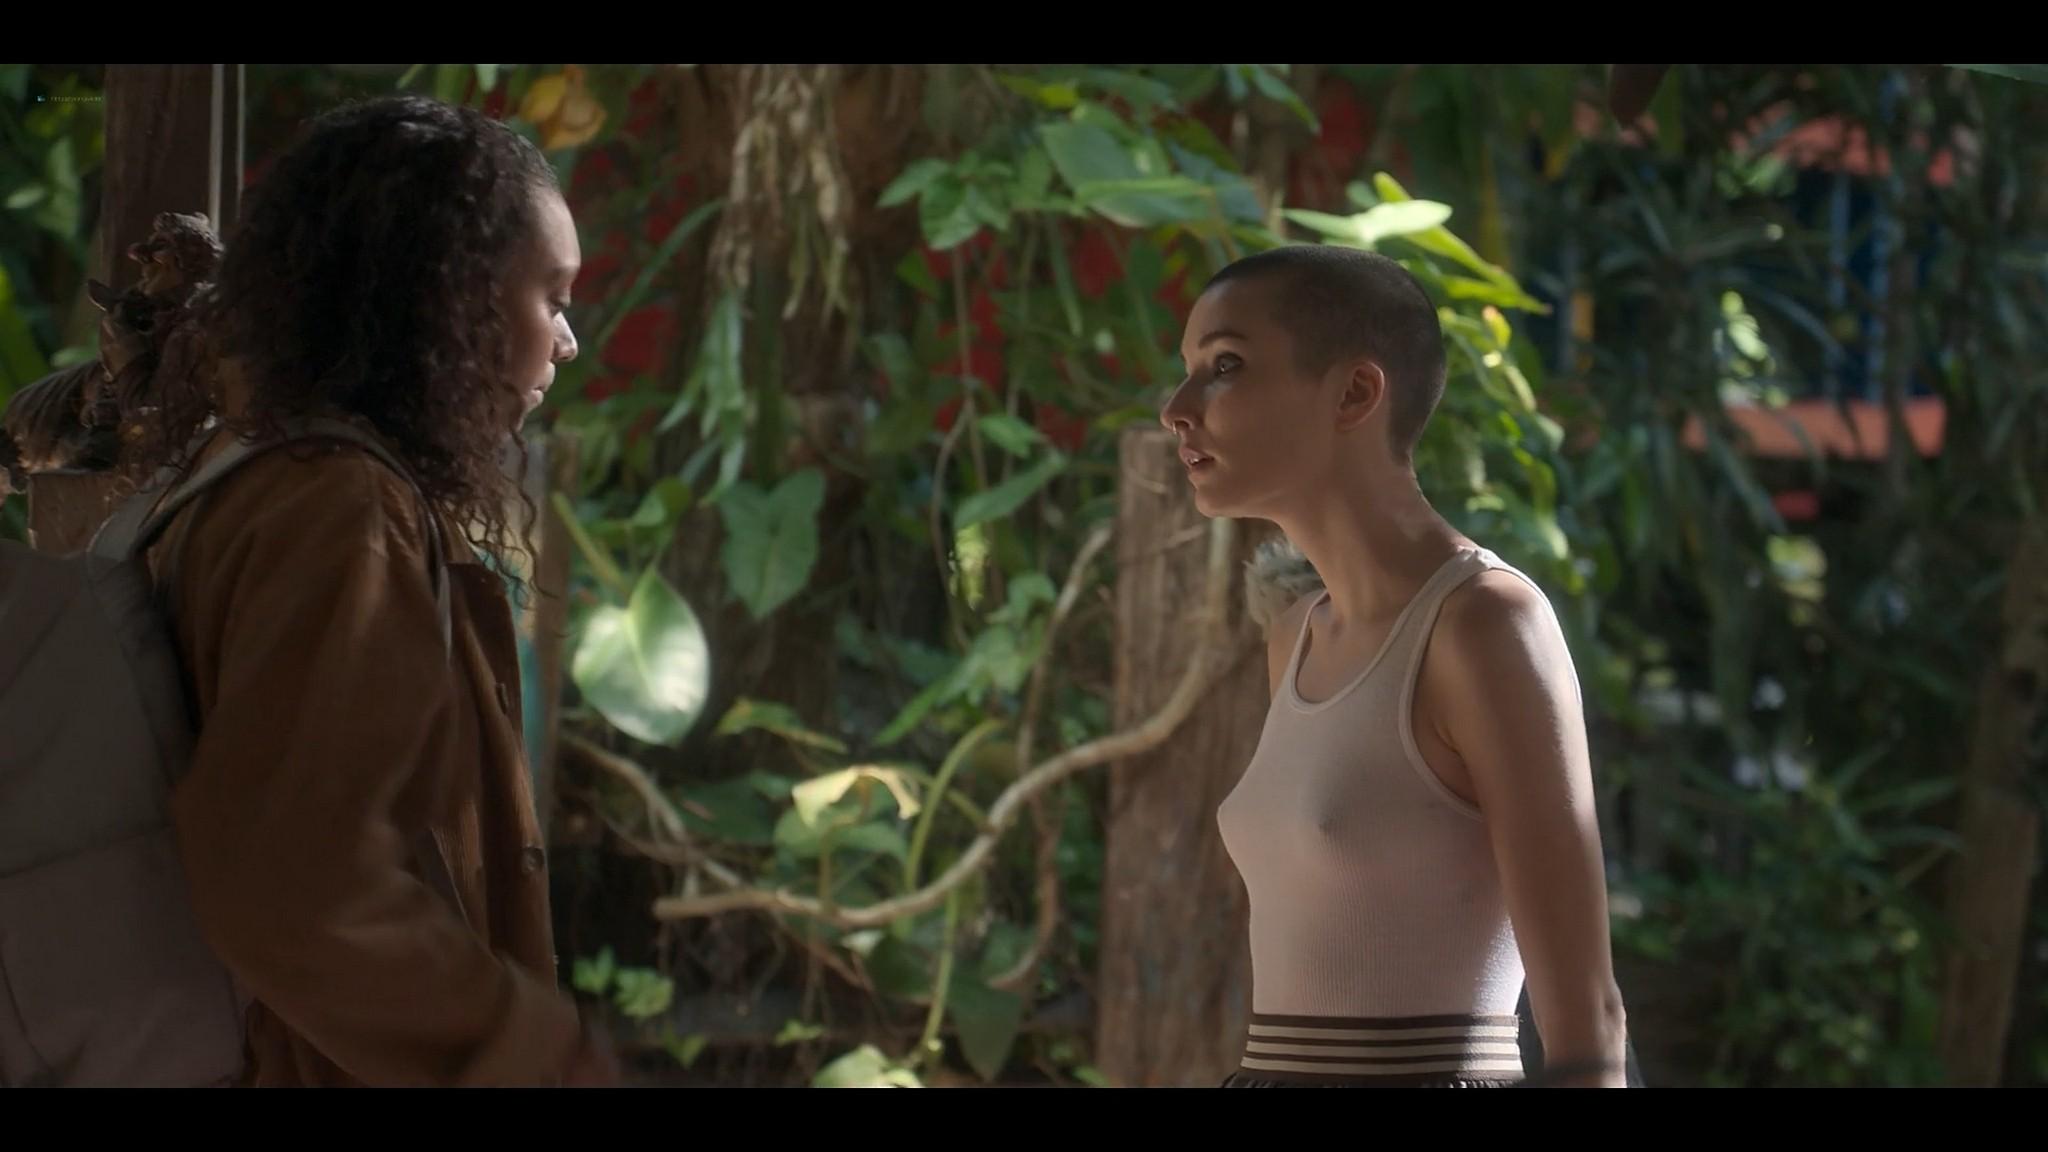 BeBe Bettencourt sexy Sophie Wilde Priscilla Doueihy hot lesbian sex Eden AU 2021 s1e4 8 1080p Web 8